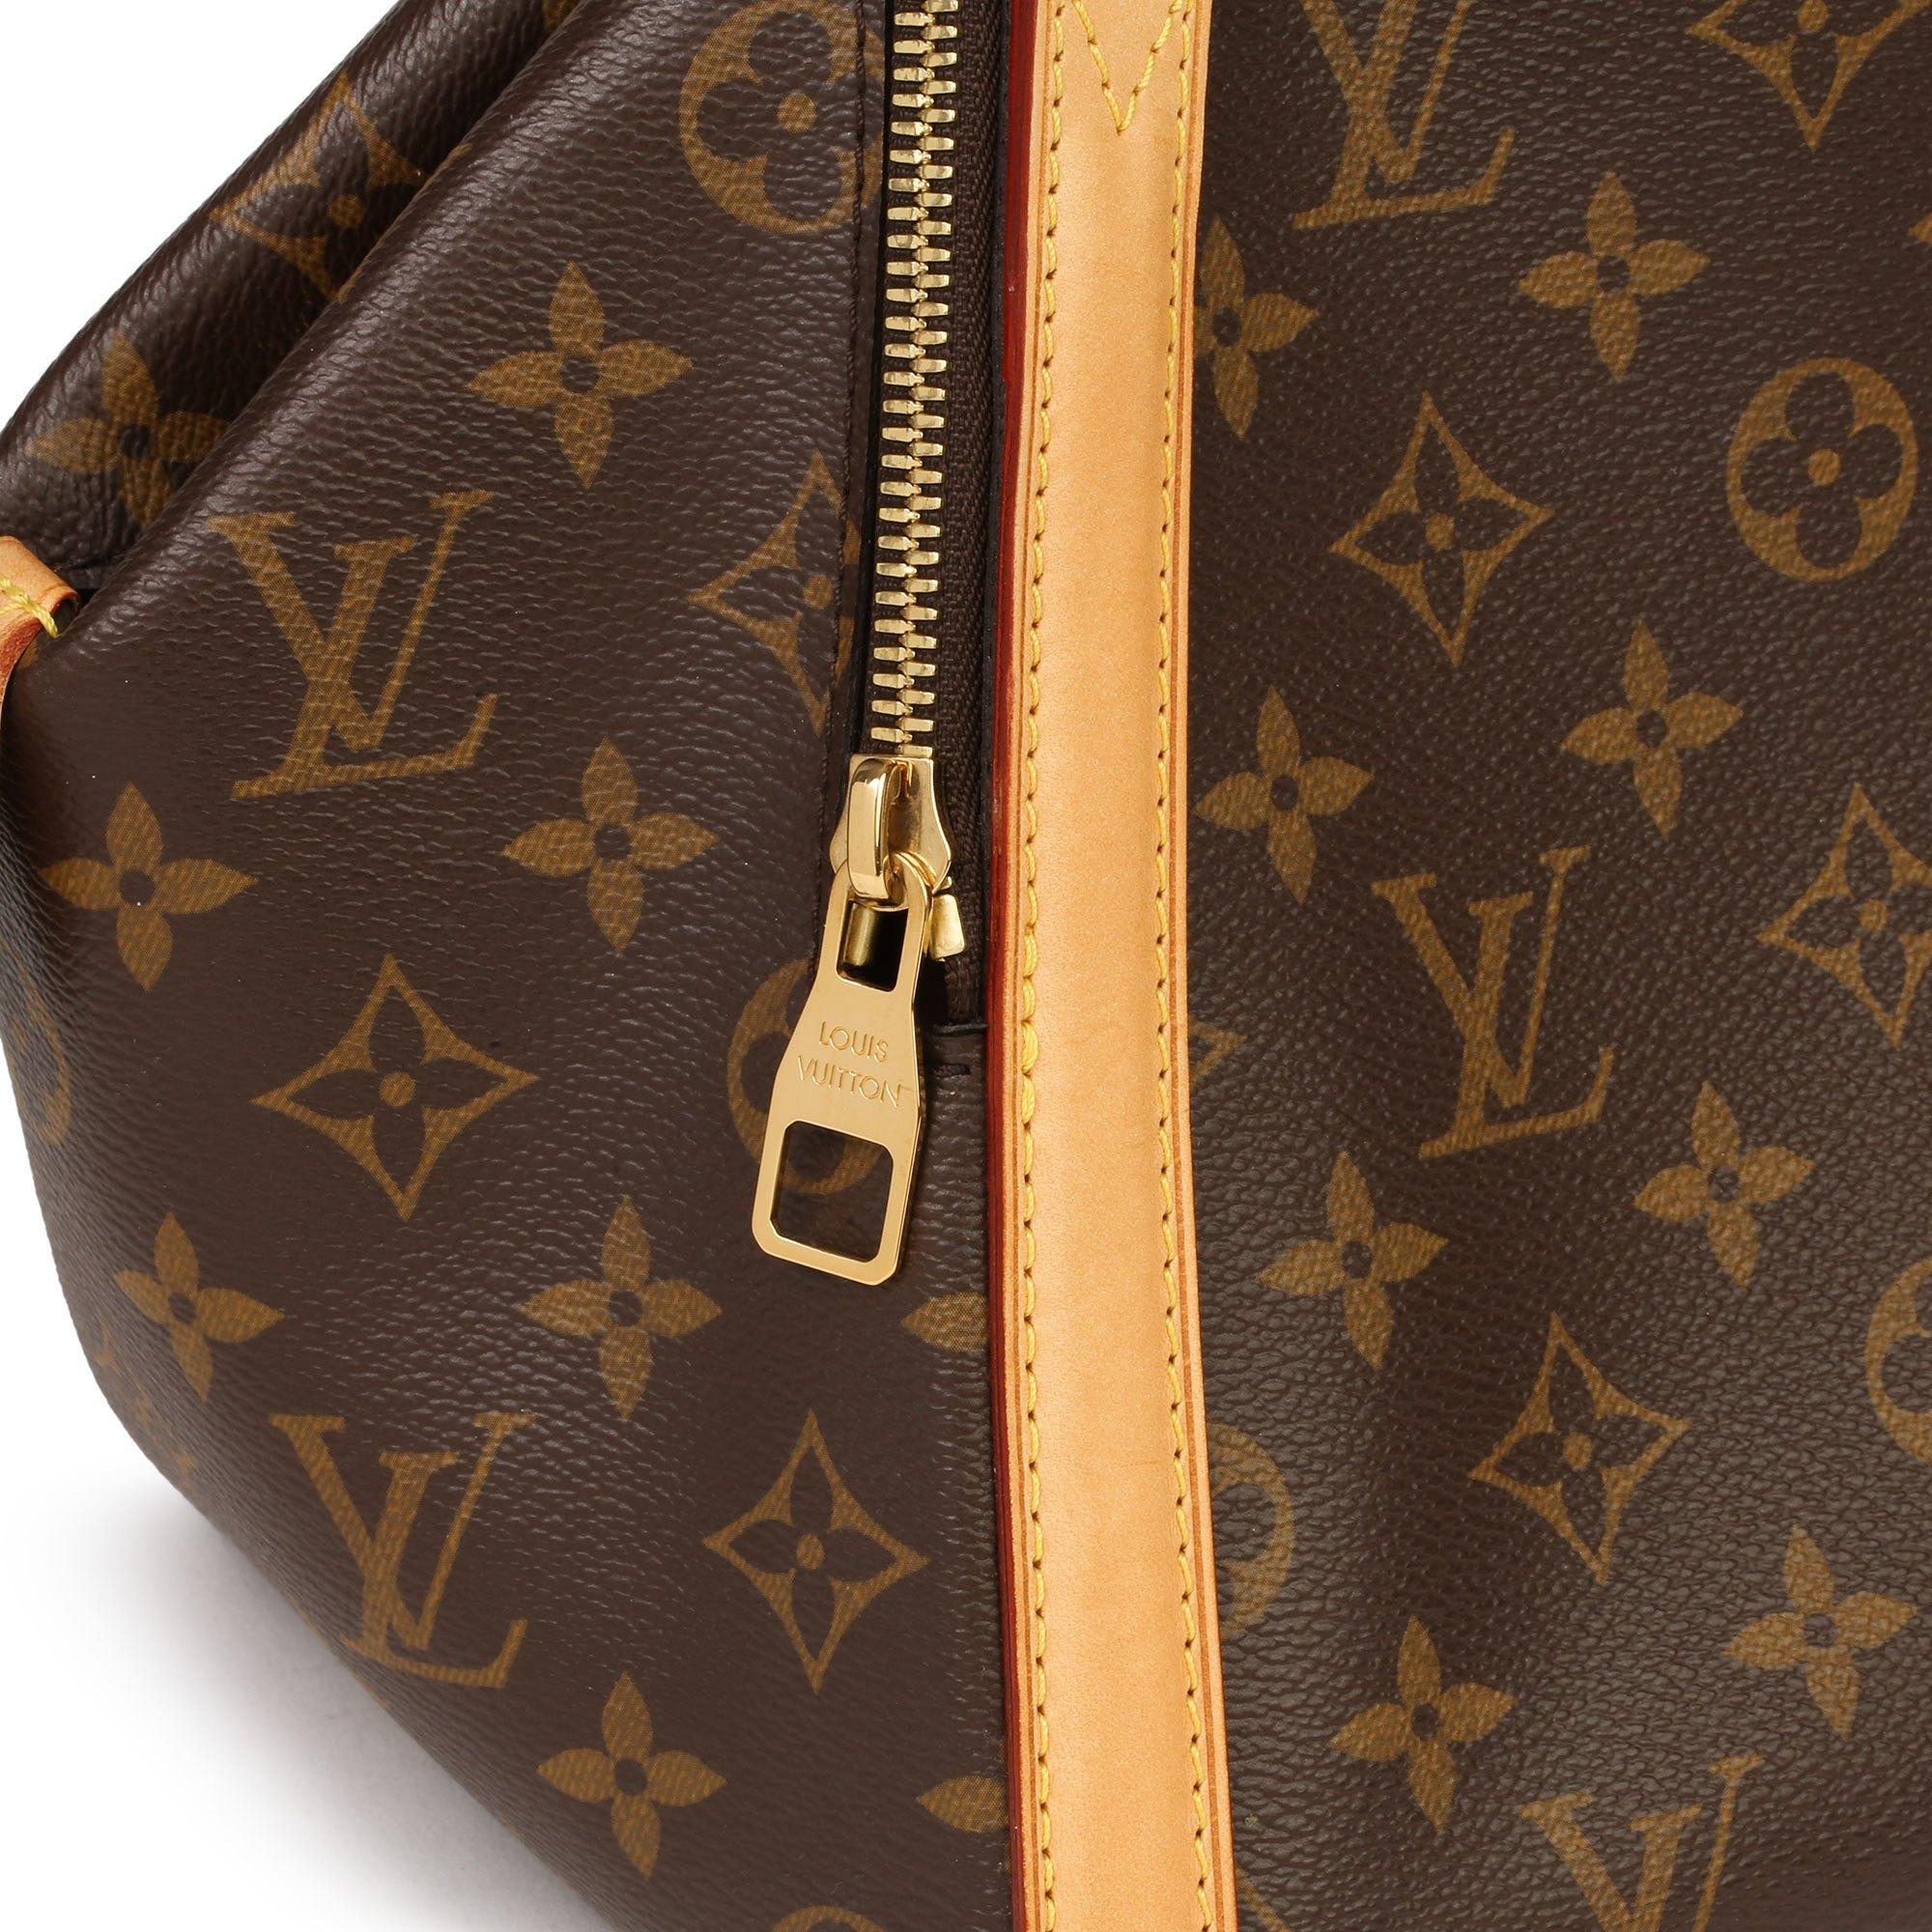 Louis Vuitton Brown Monogram Coated Canvas Vachetta Leather Male MM